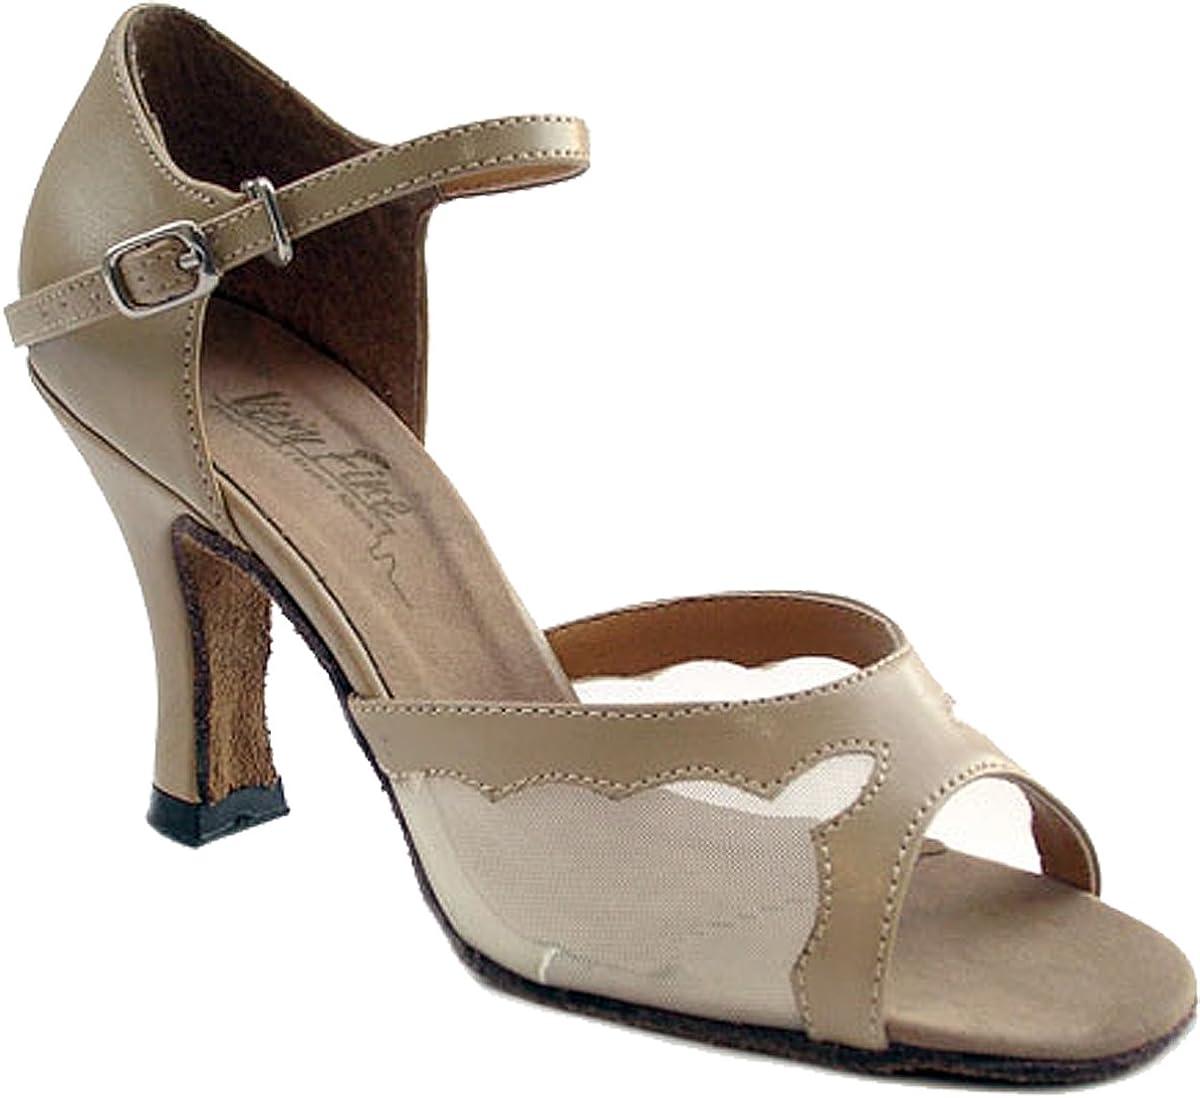 Very Fine Womens Salsa Ballroom Tango Dance Shoes Style 1616 Bundle with Plastic Dance Shoe Heel Protectors Tan Leather 7.5 M US Heel 3 Inch